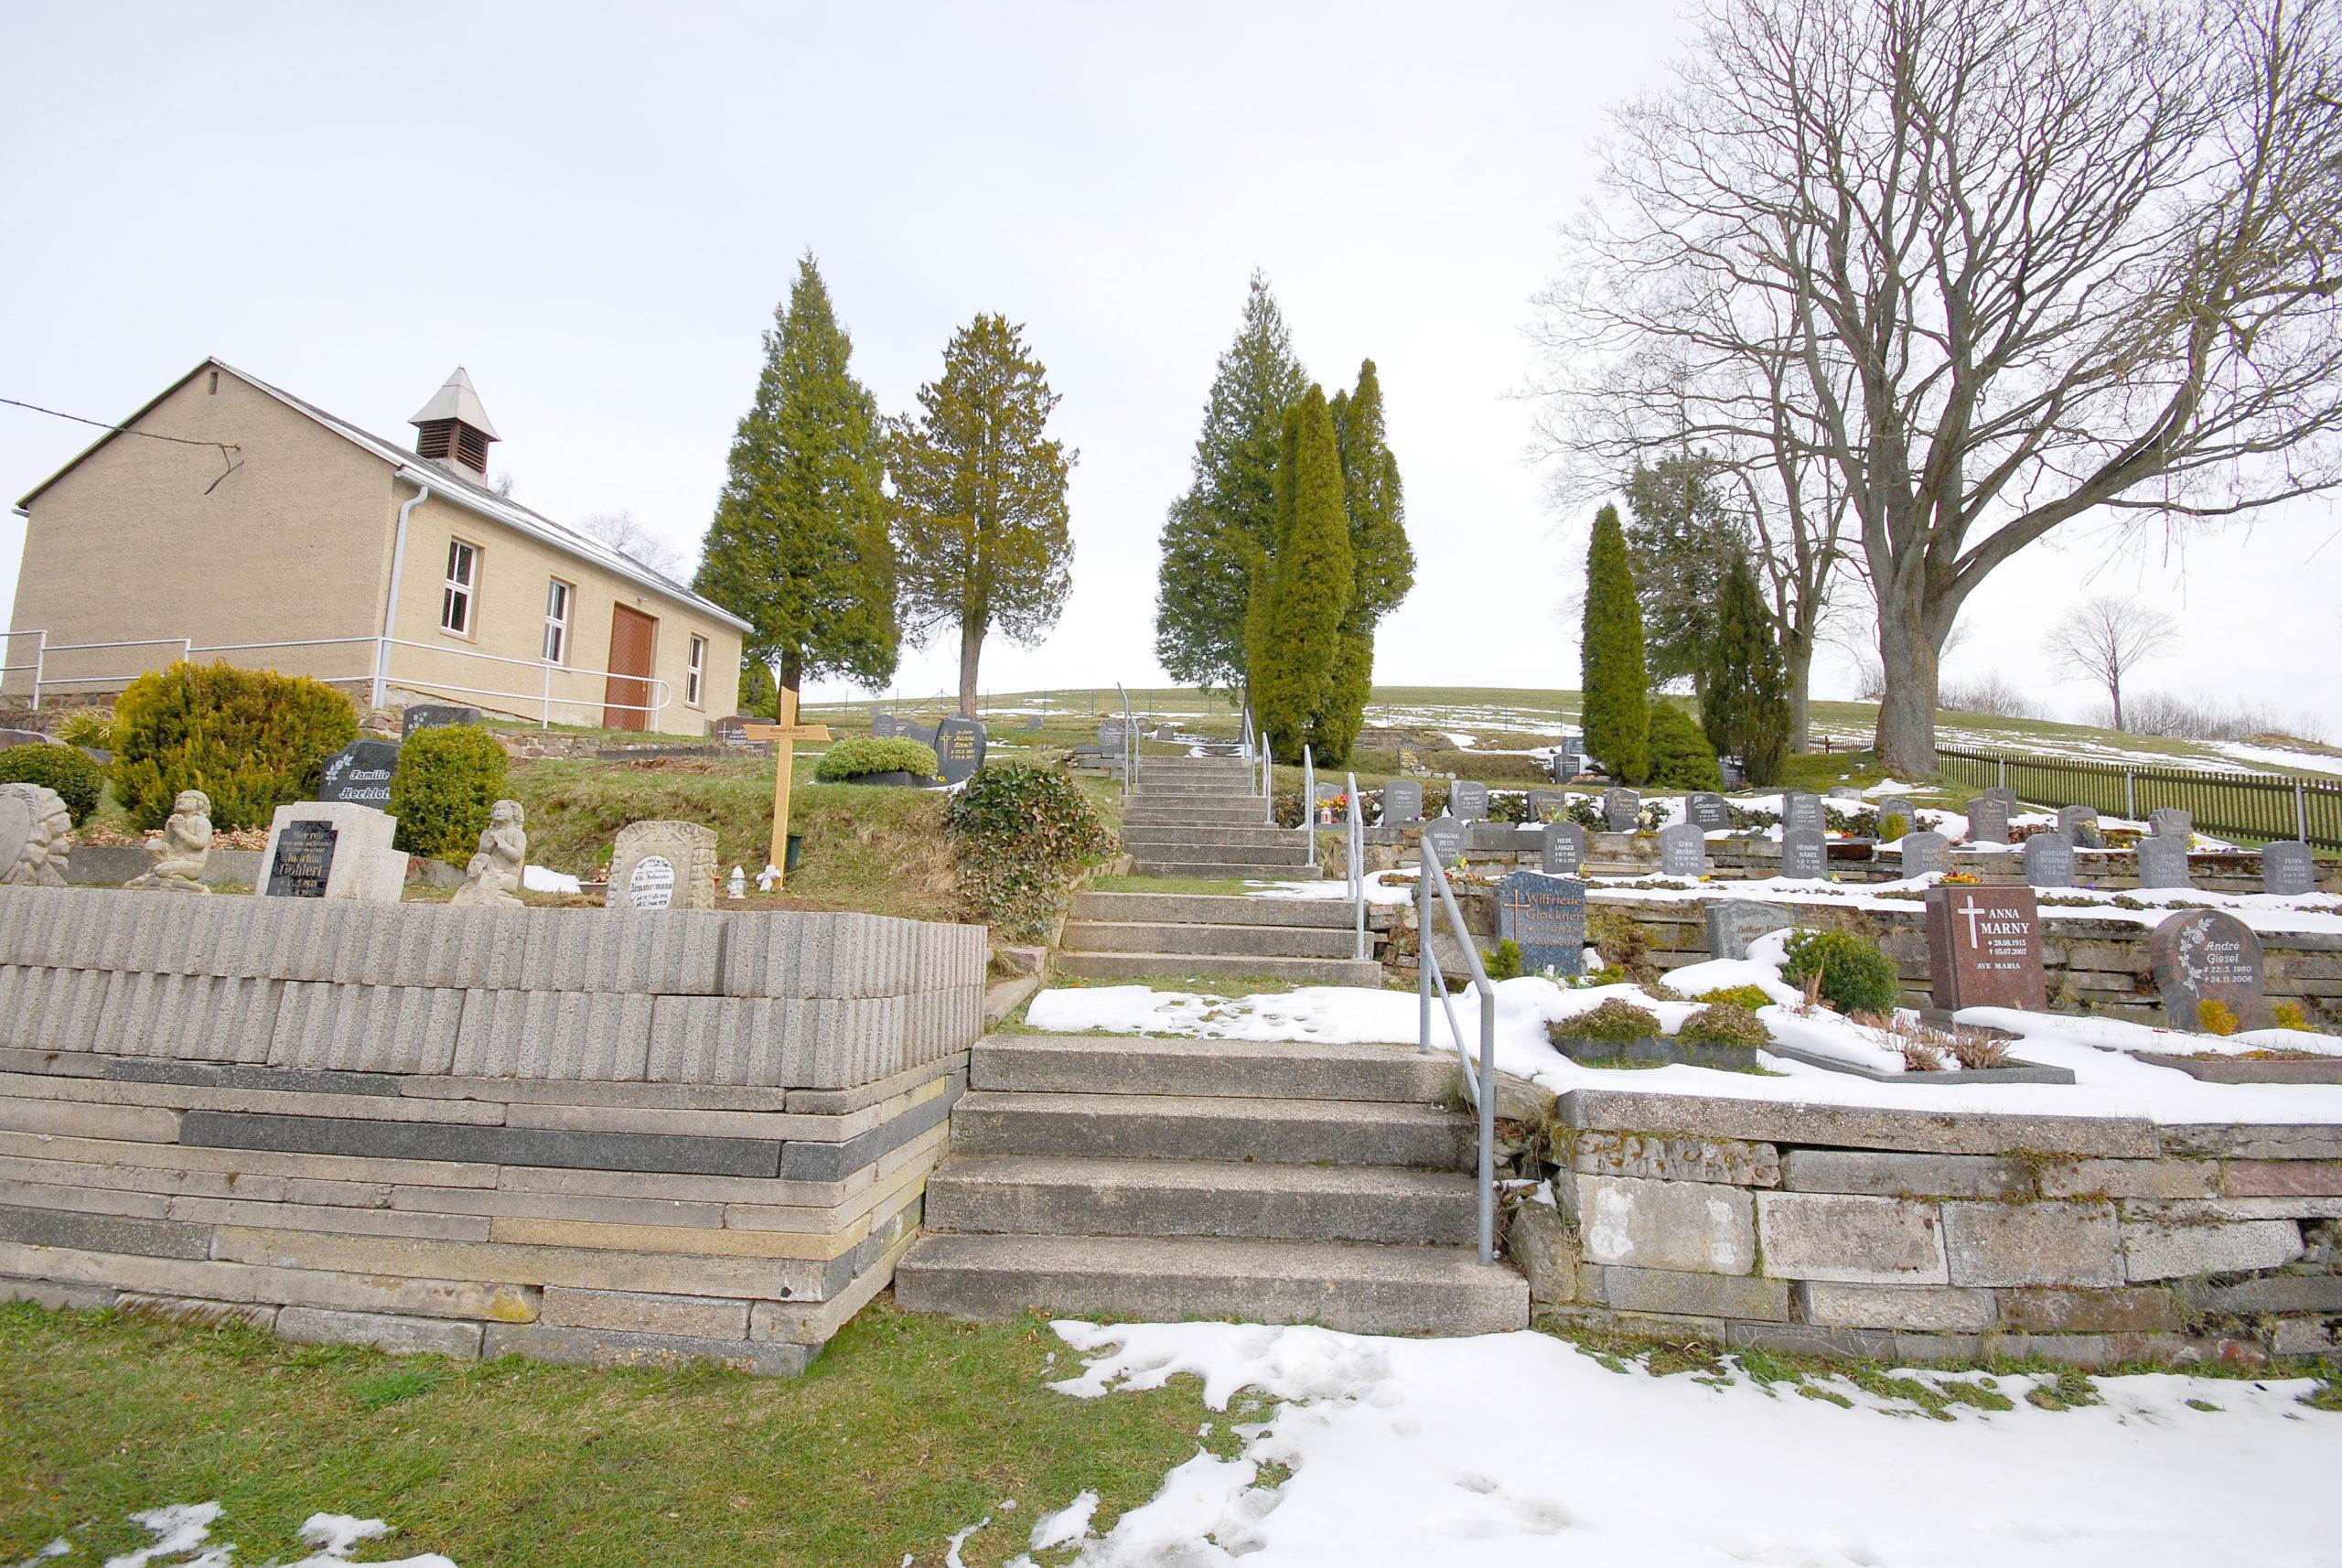 Friedhof Heidersdorf - Blick rechts der Trauerhalle